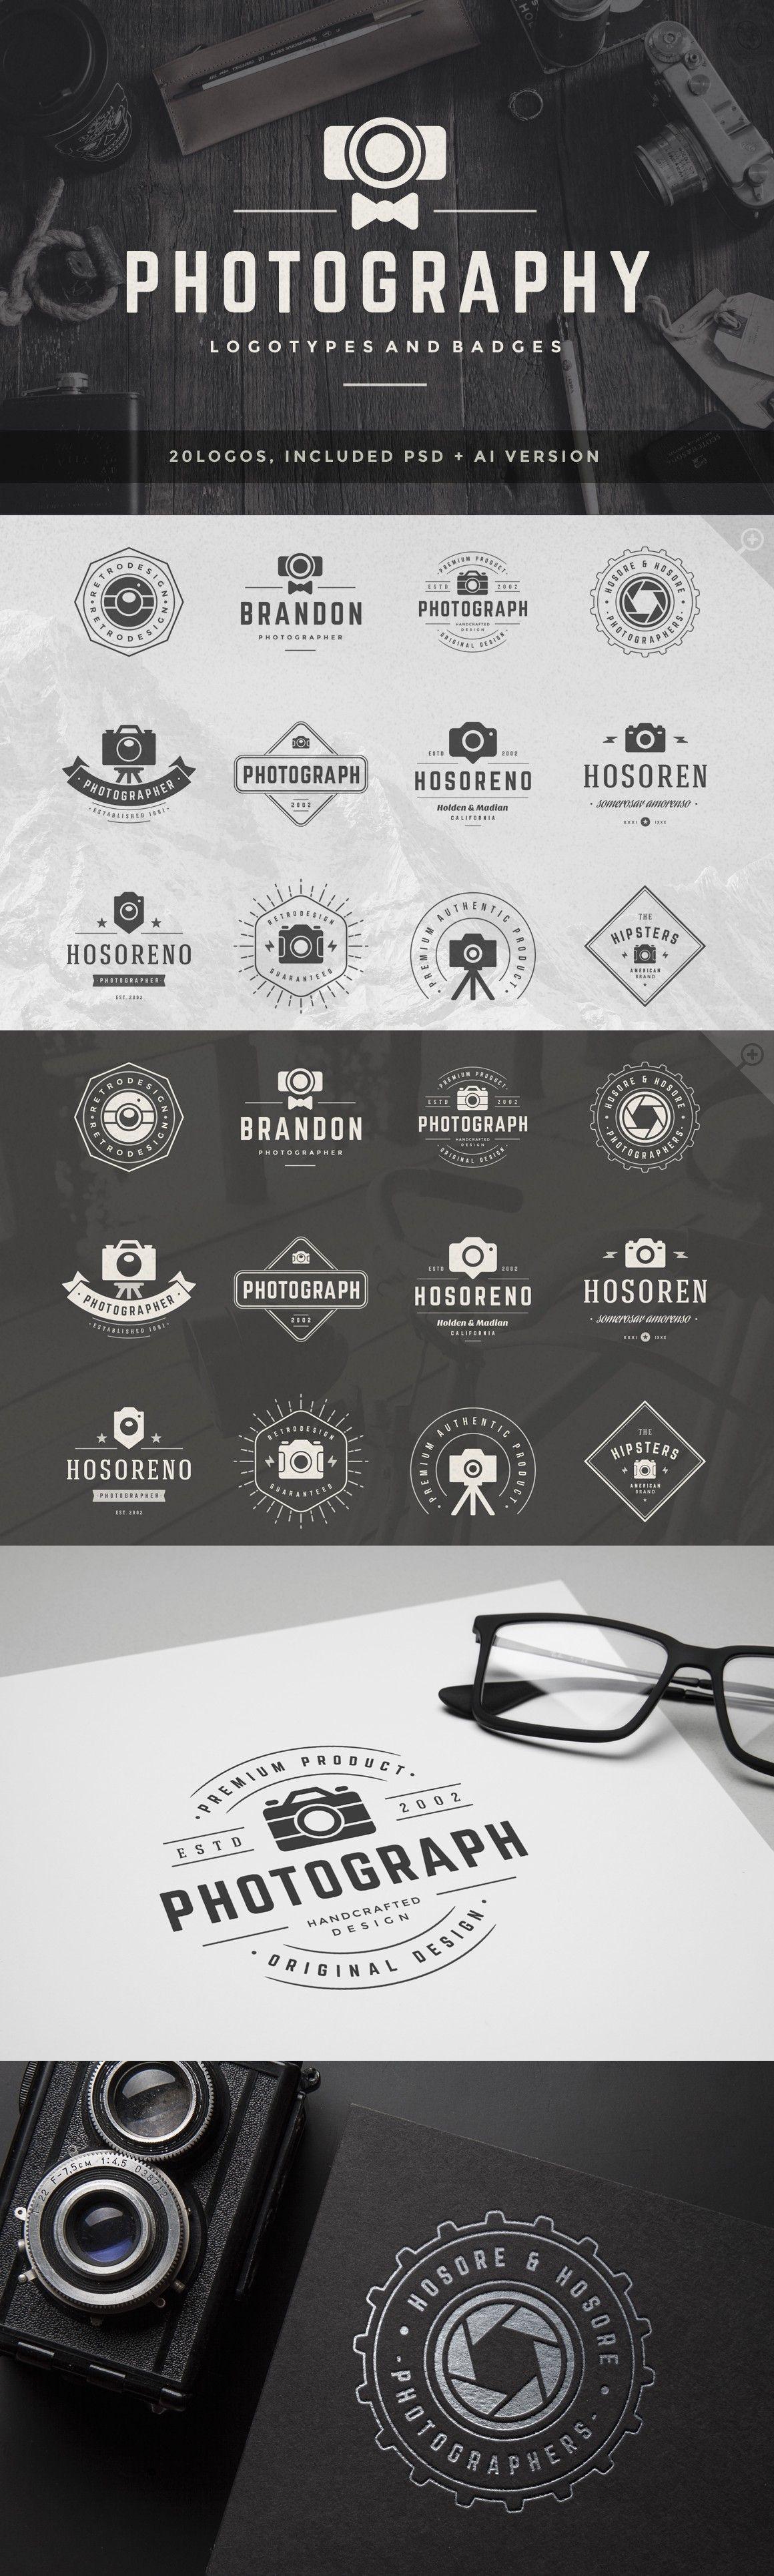 20 Photography logos and badges Photography logos